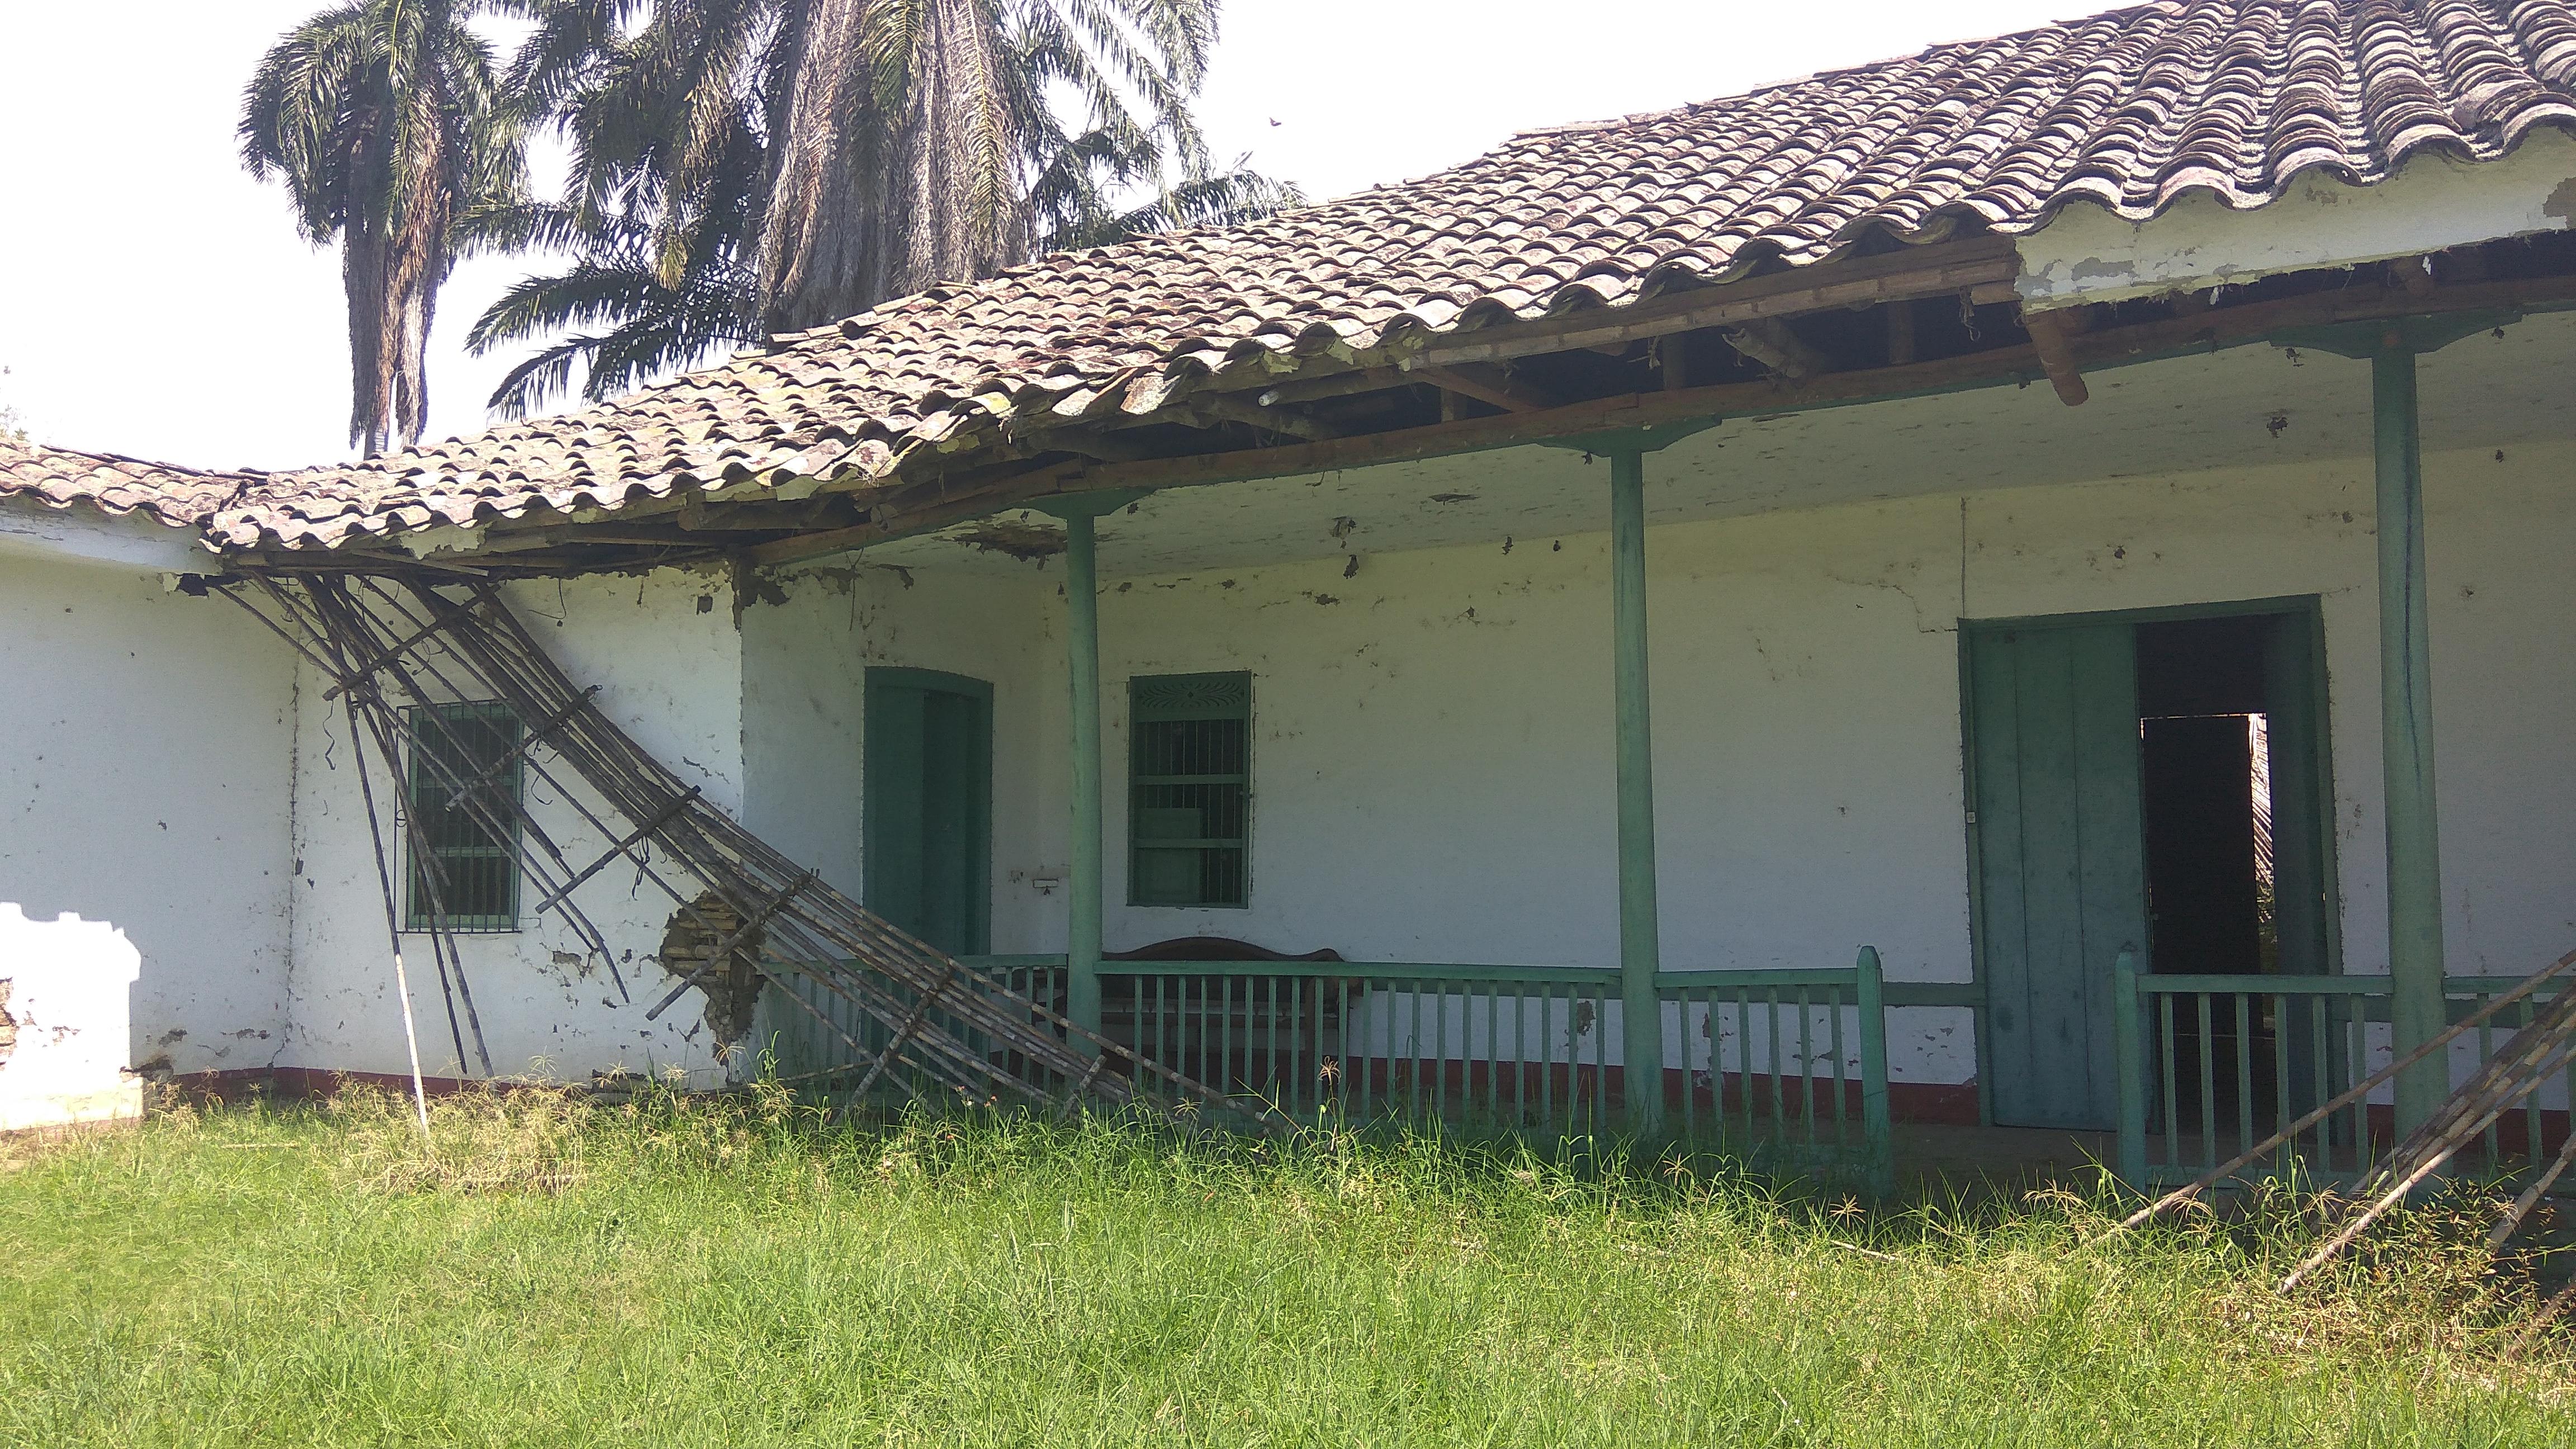 Hacienda Antigua Colombia Intacta  ZZTrVL